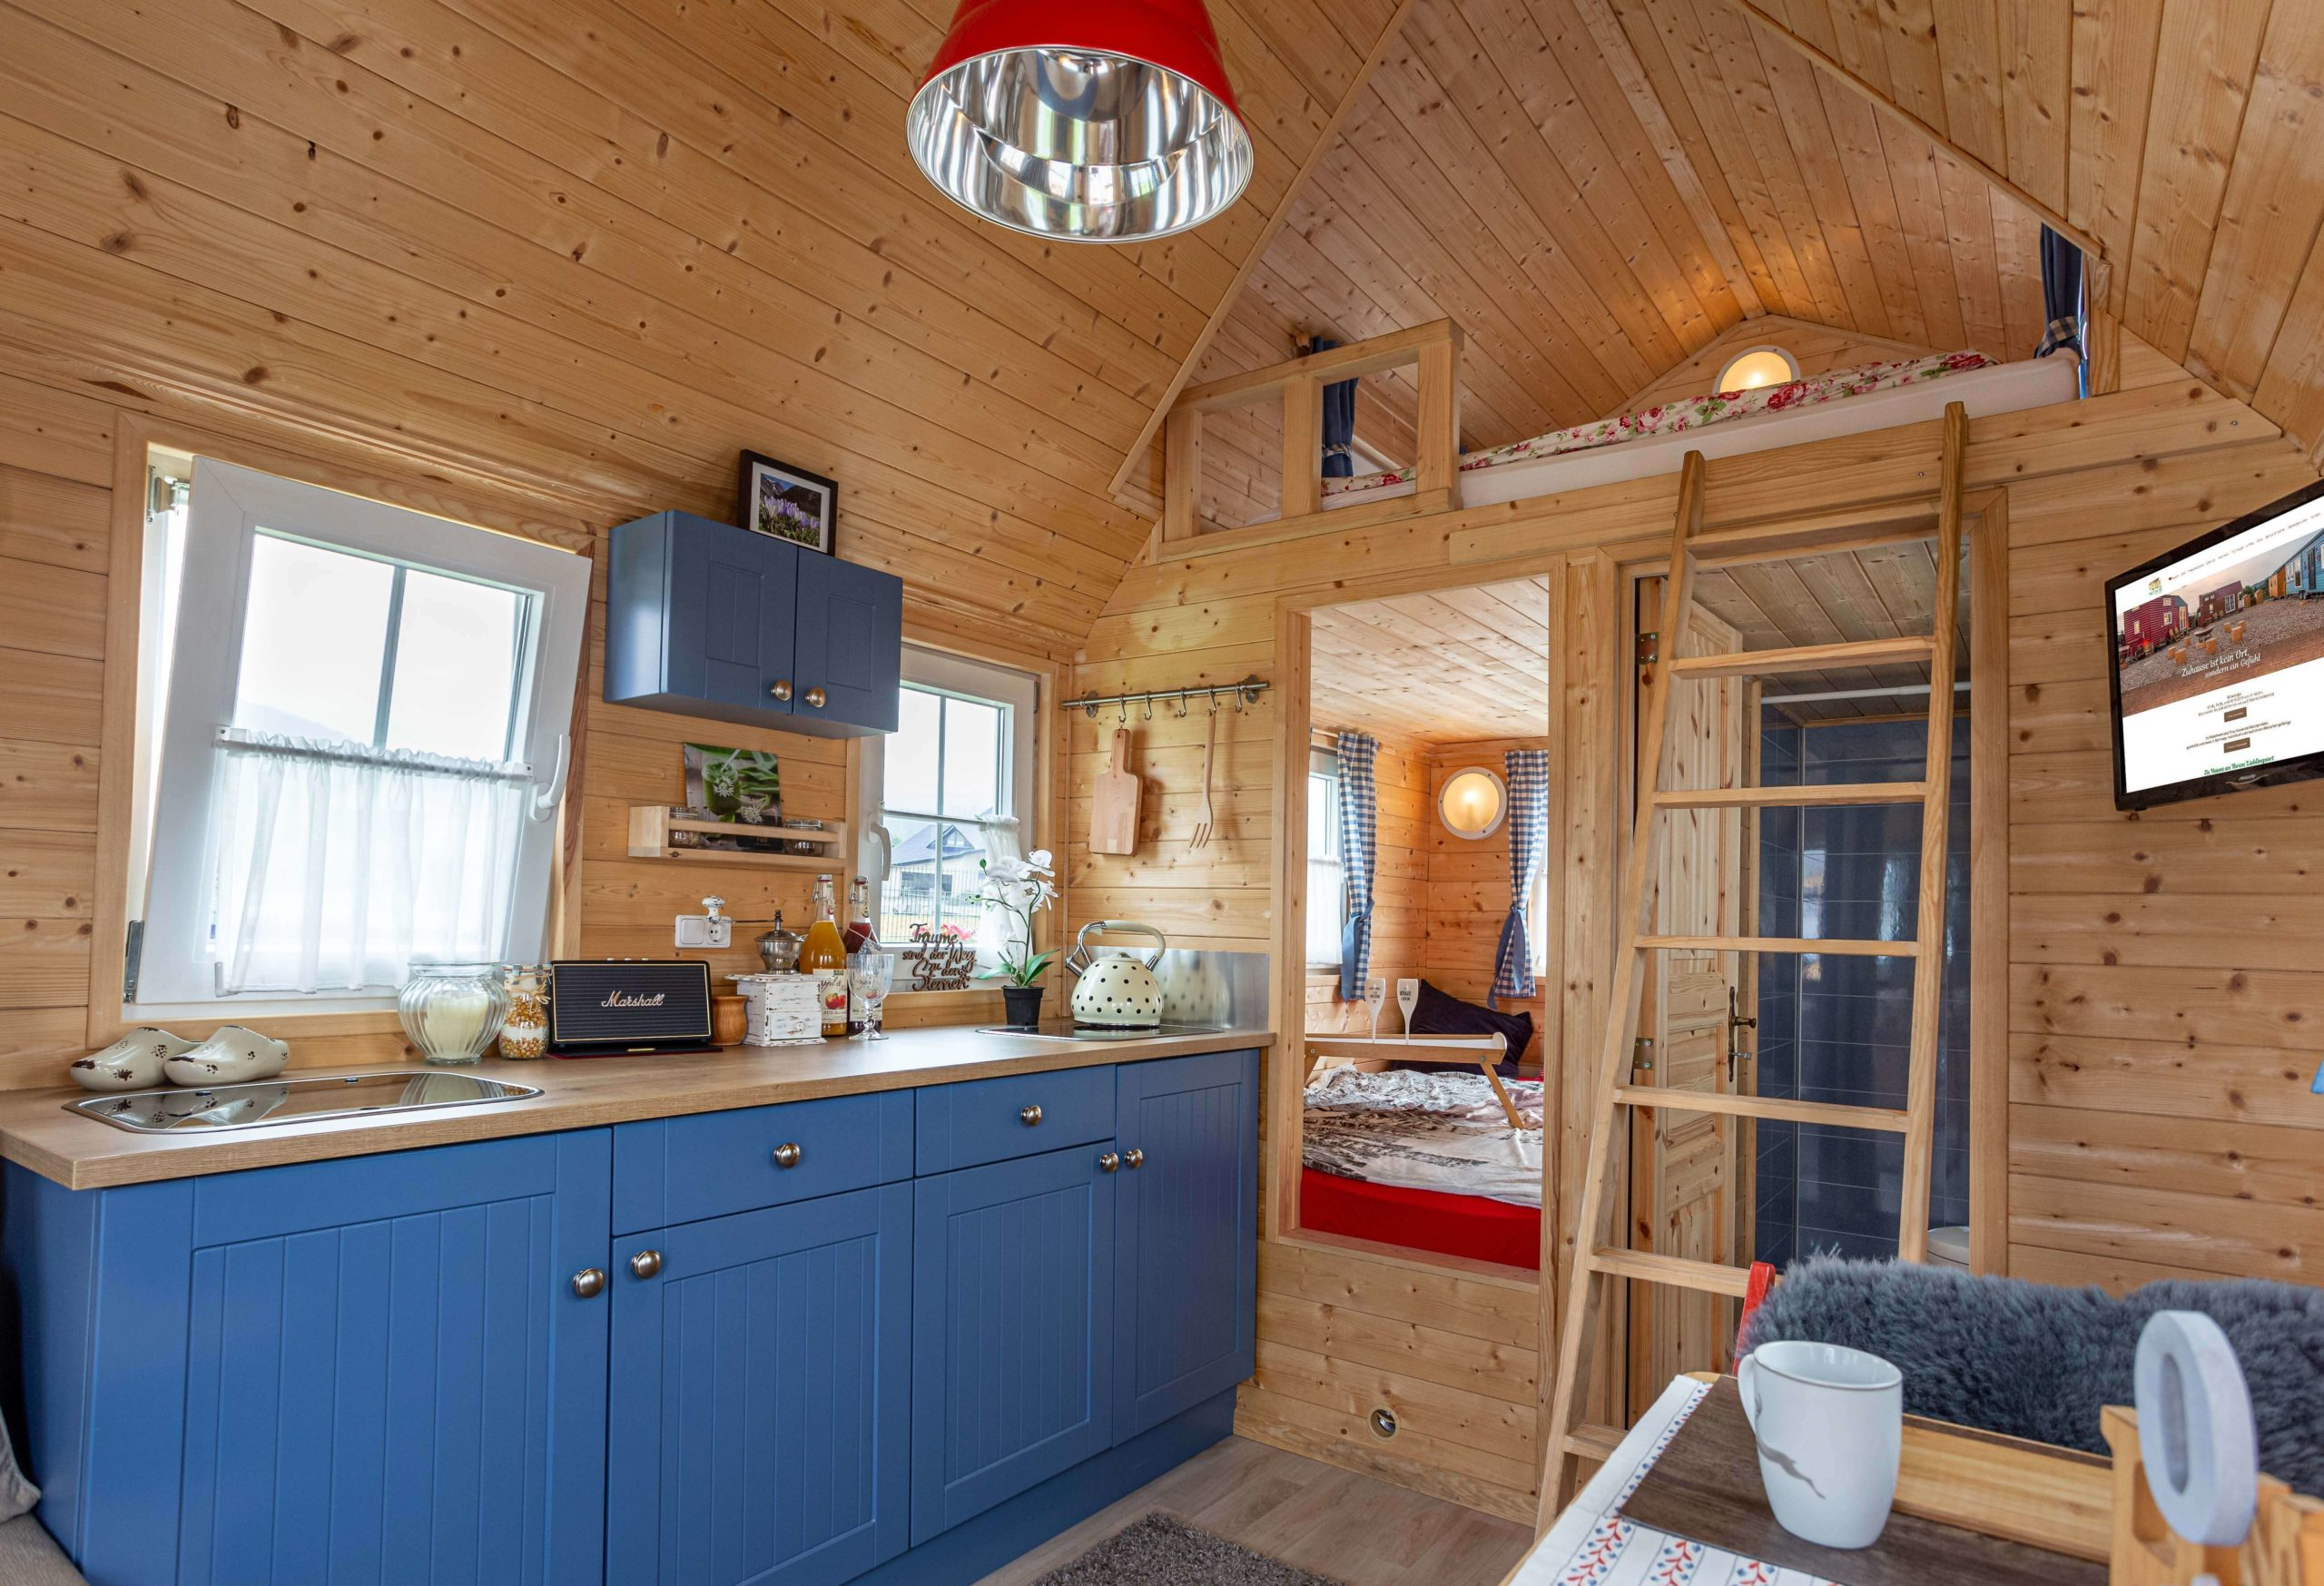 mobiles-tiny-house-island-vital-camp-gmbh-11